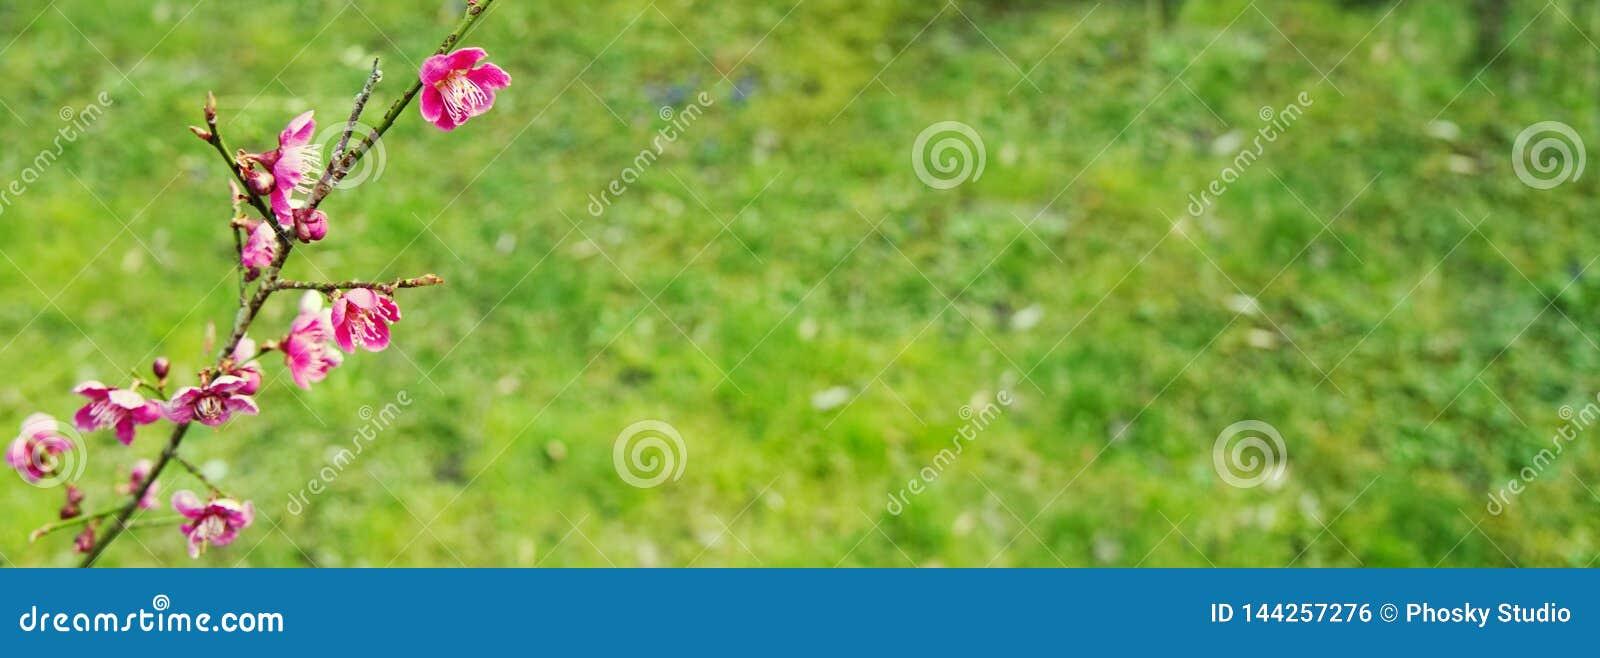 Menchia kwitnie na tle trawa